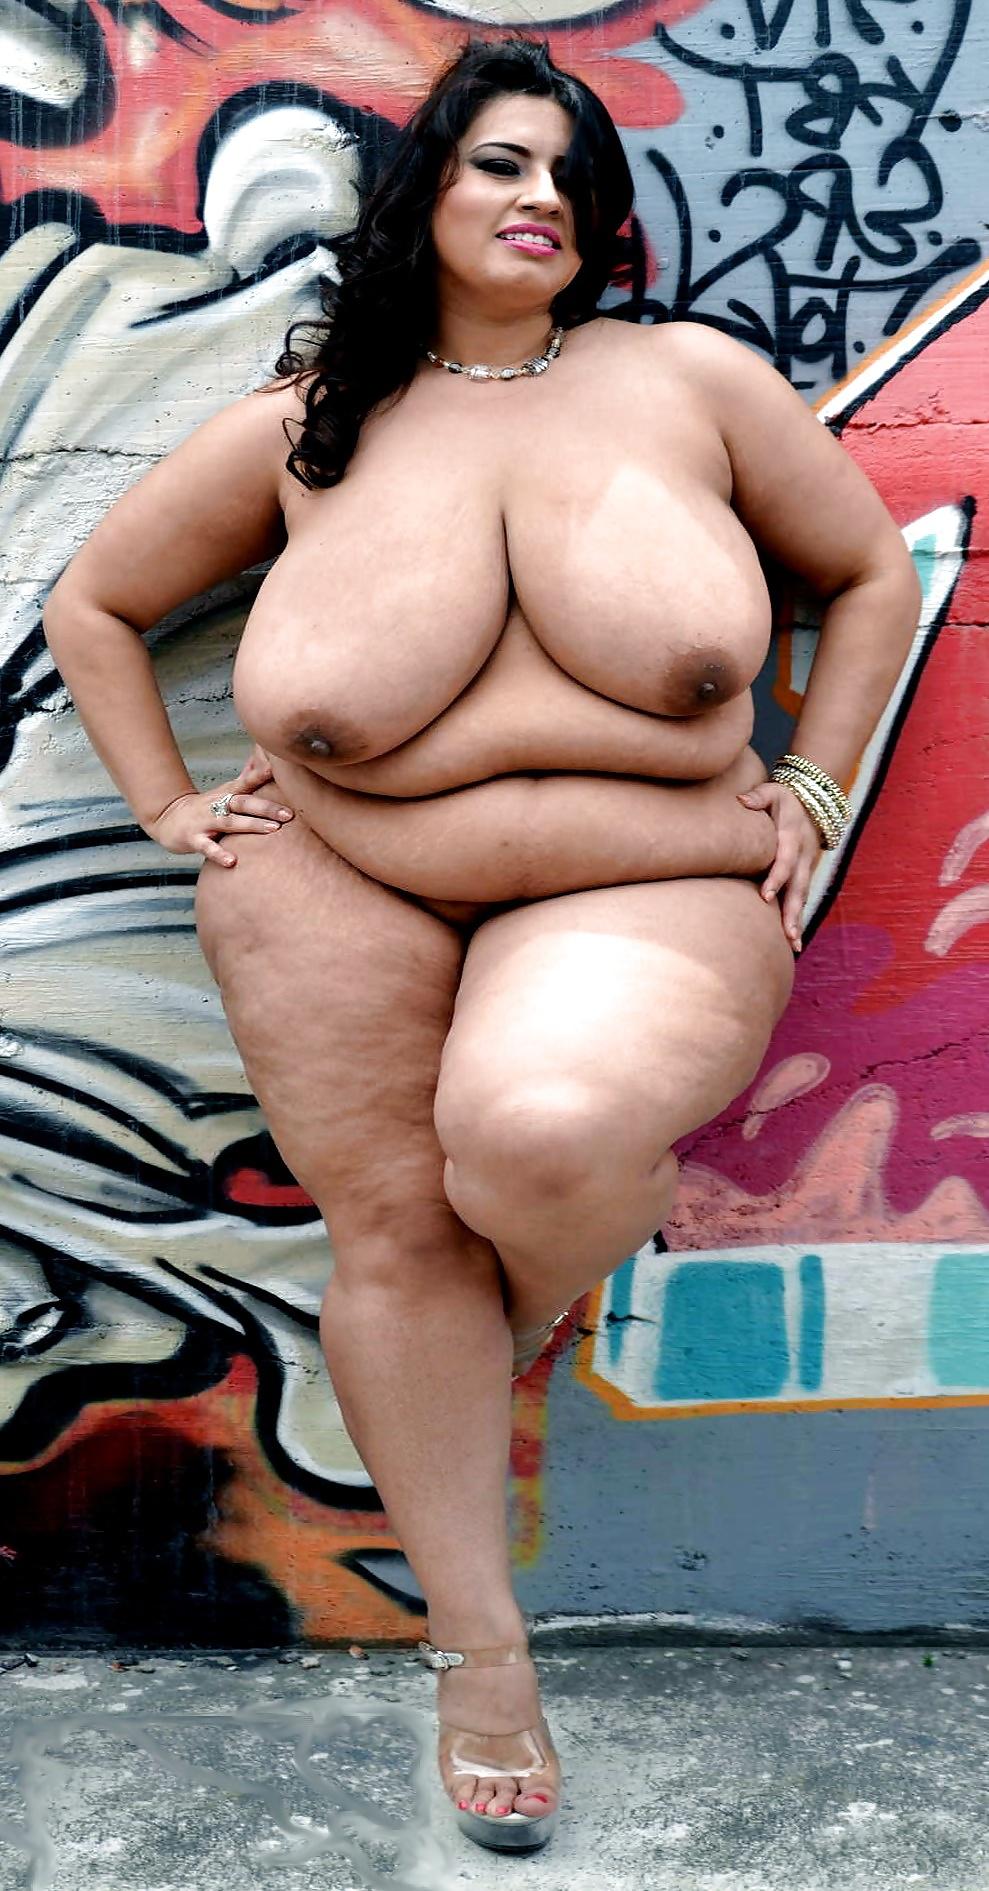 puertorican-naked-bbw-the-simpsons-hardcore-porn